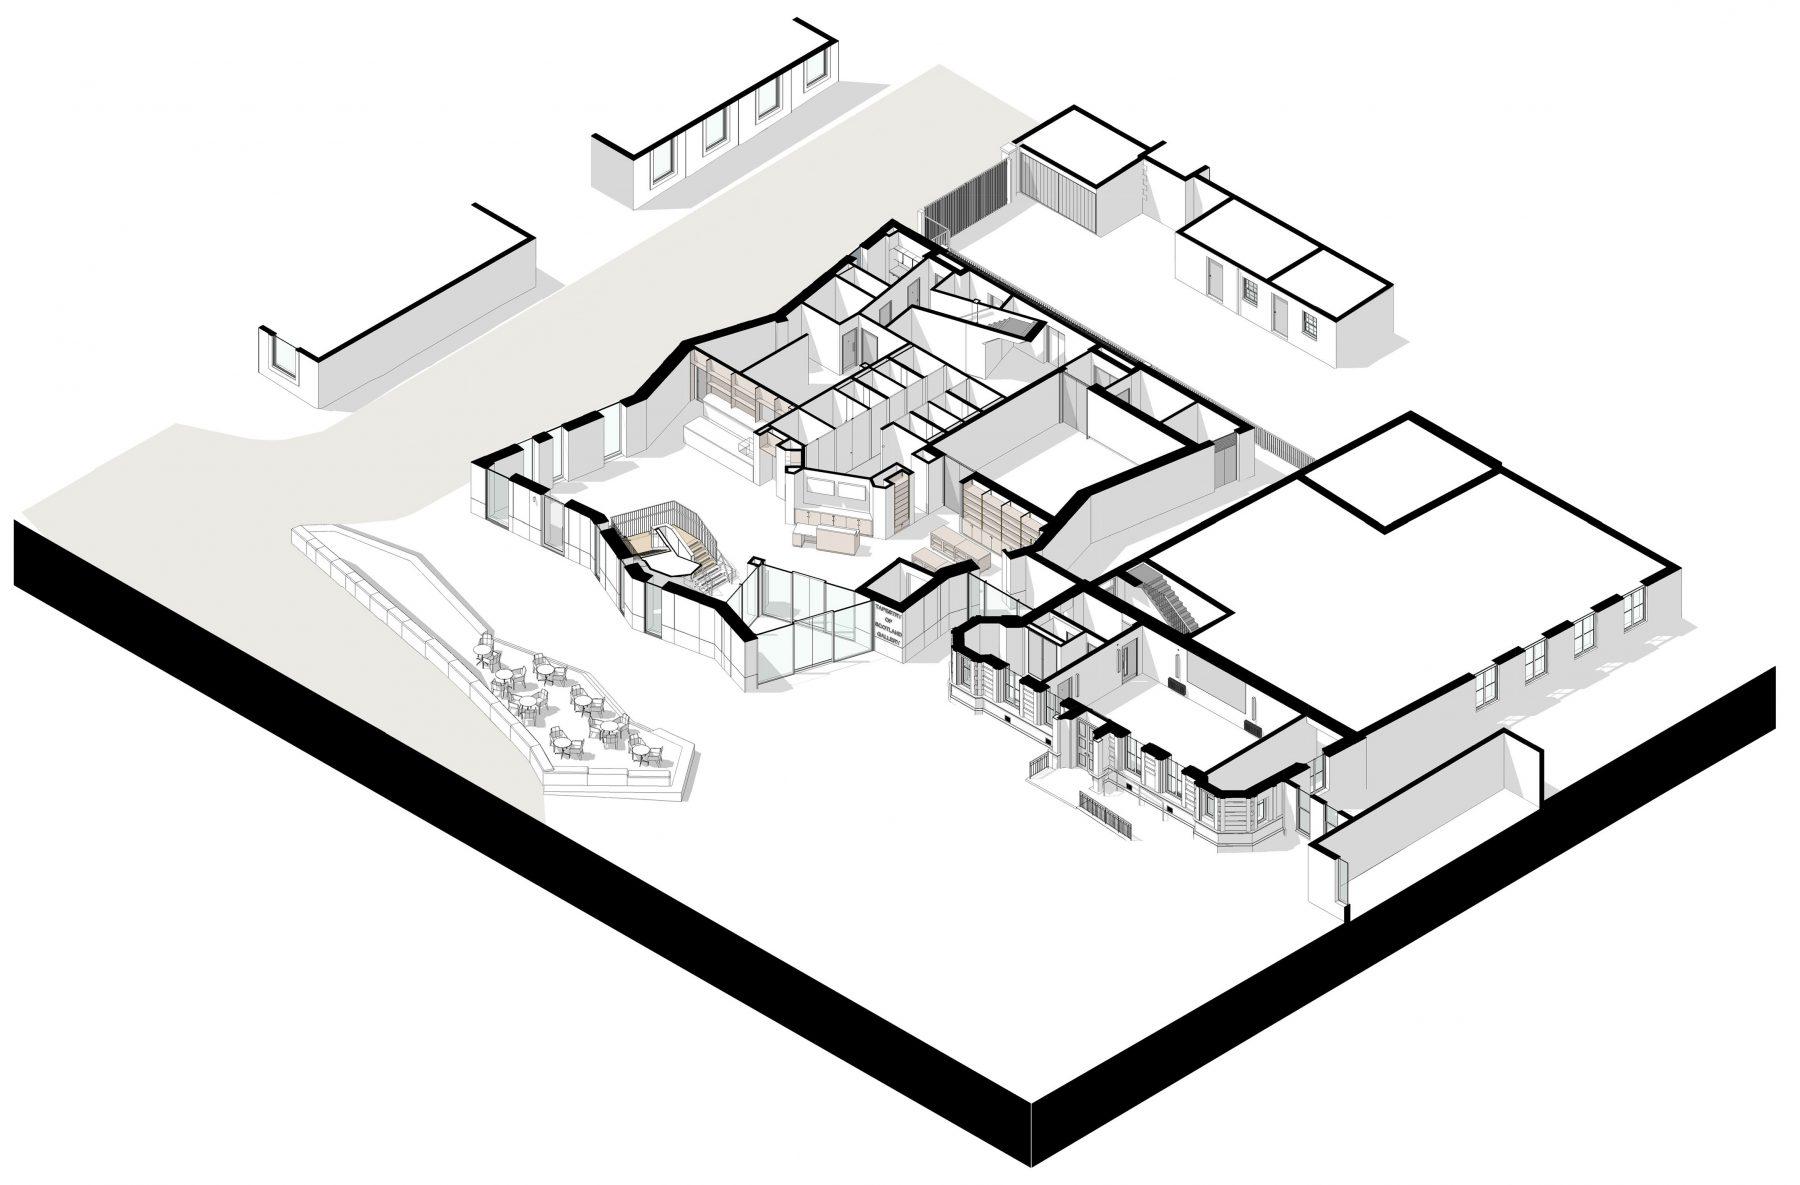 Ground Floor Axo